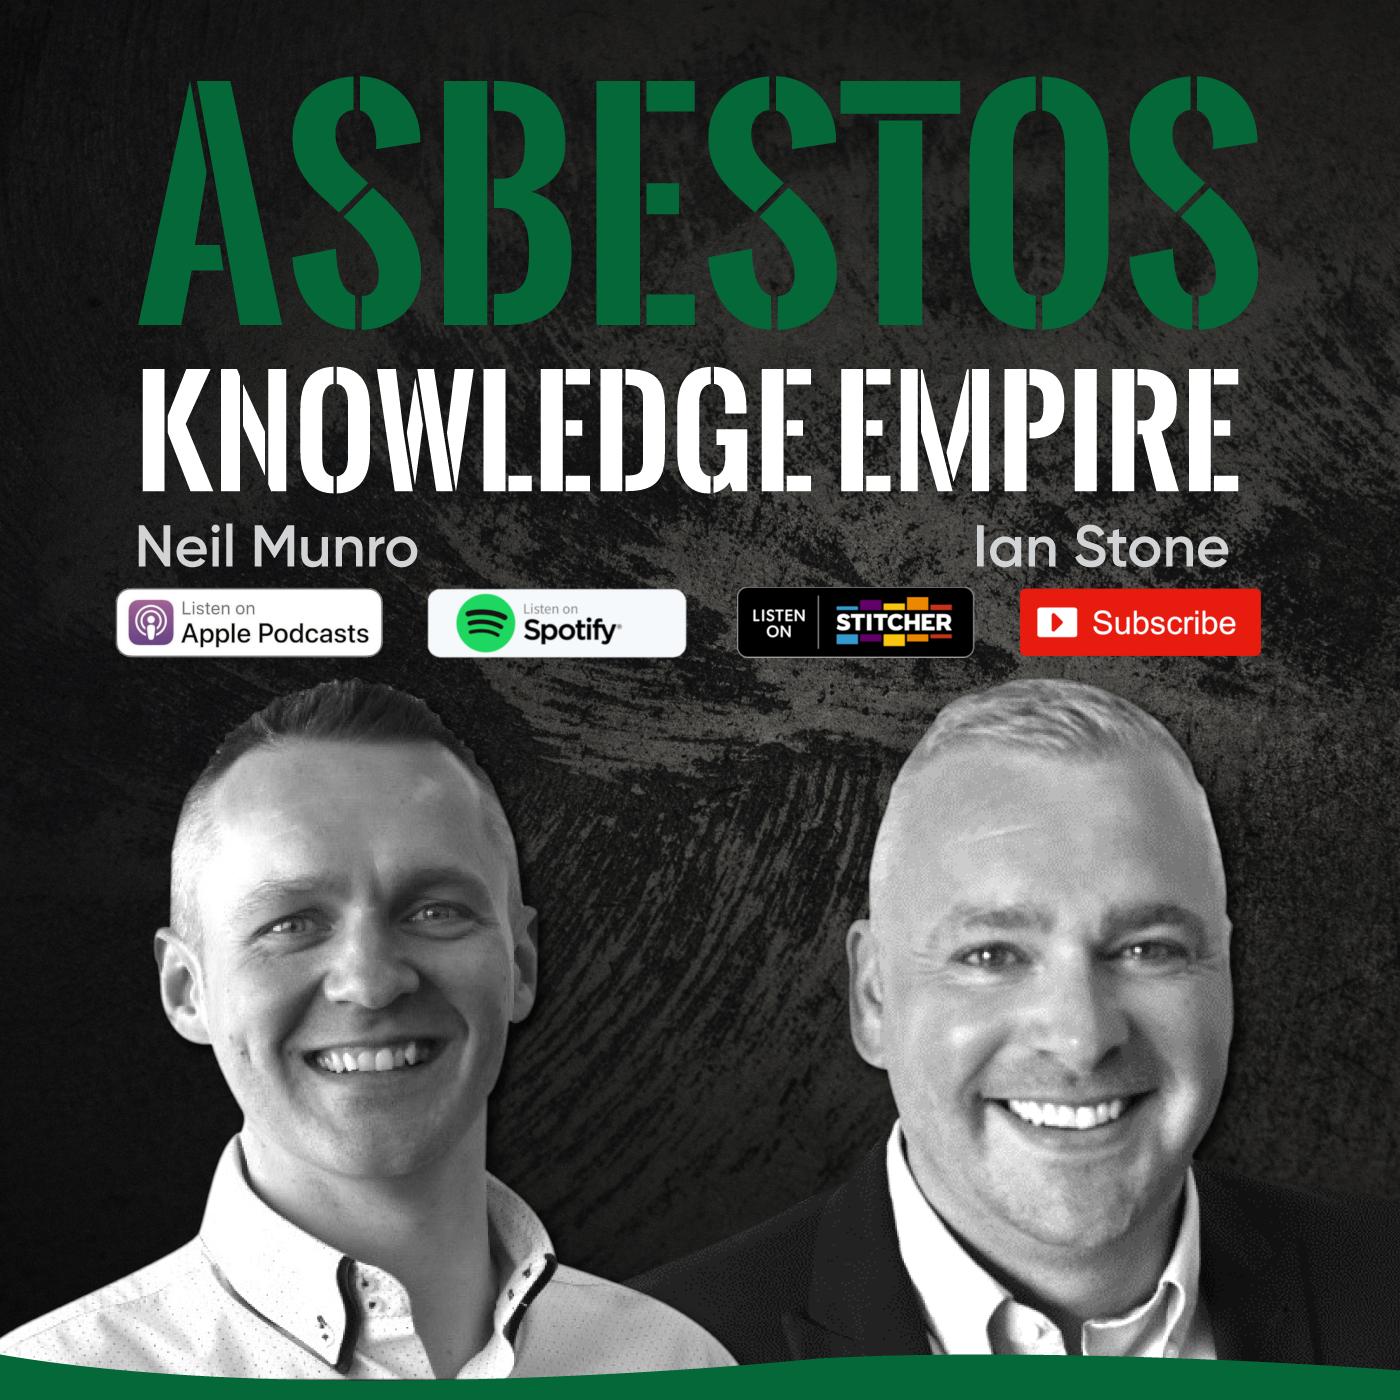 Asbestos Podcast